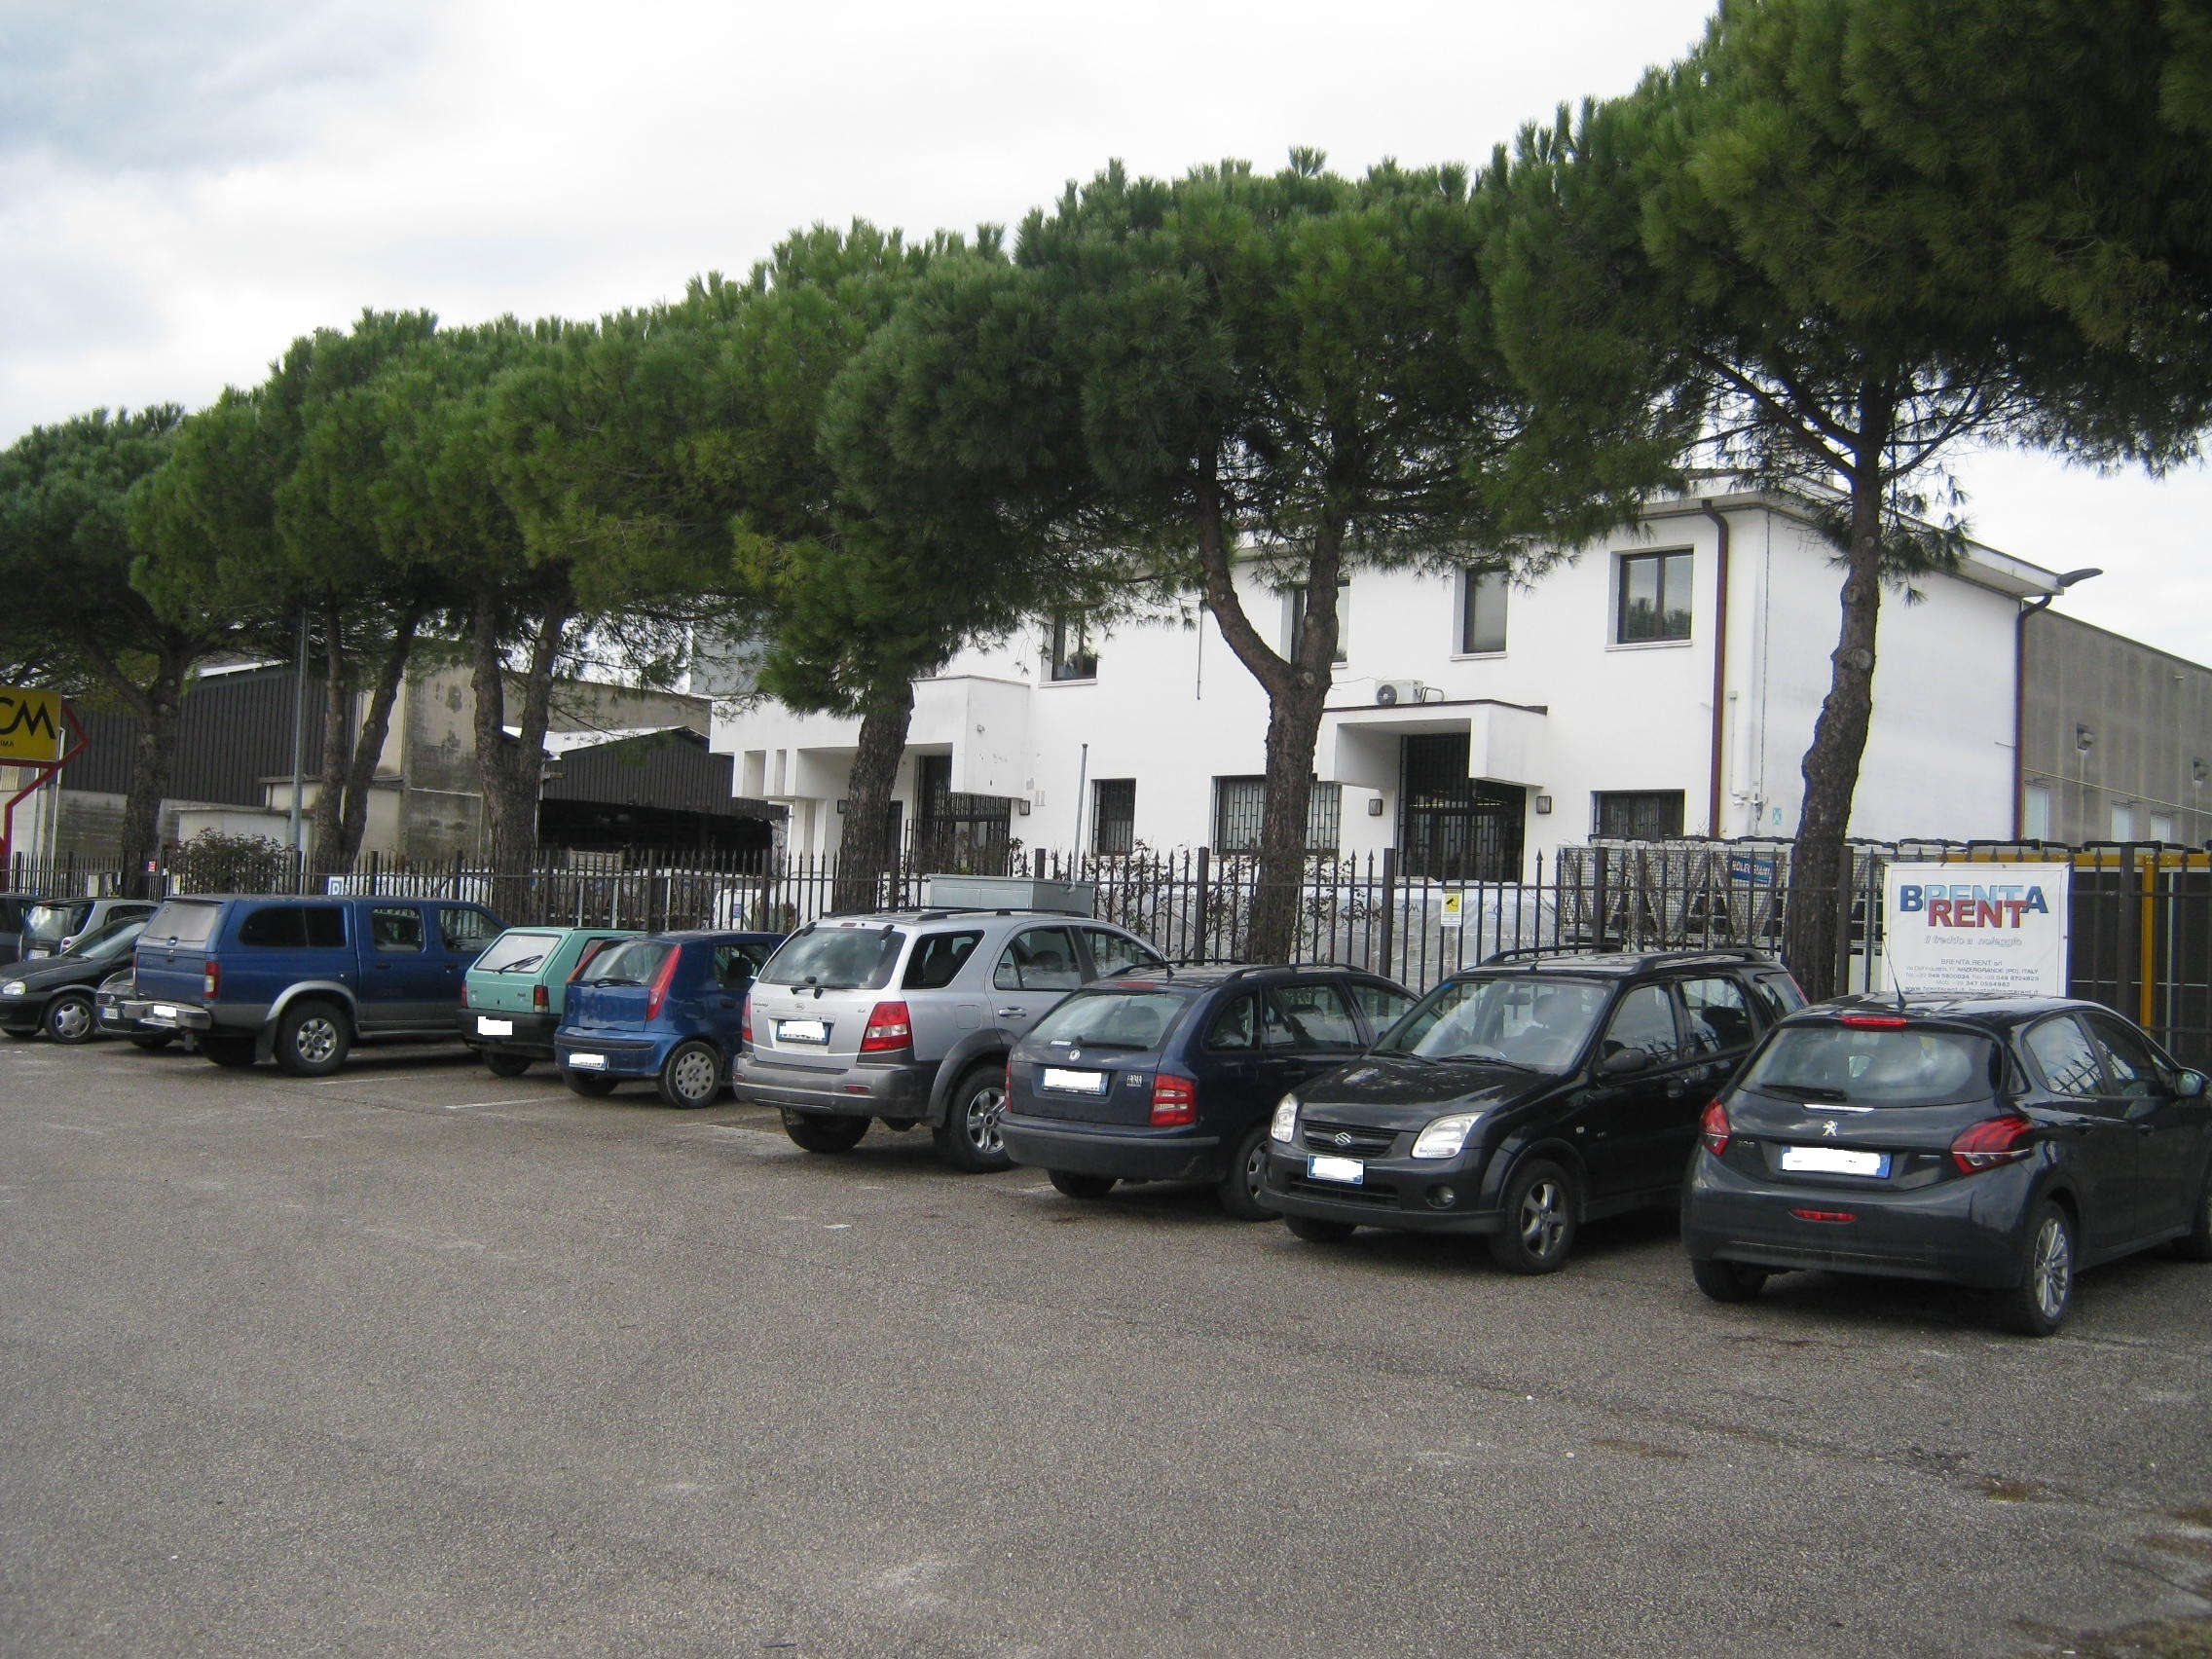 Brenta Rent - Parco Macchine (3)